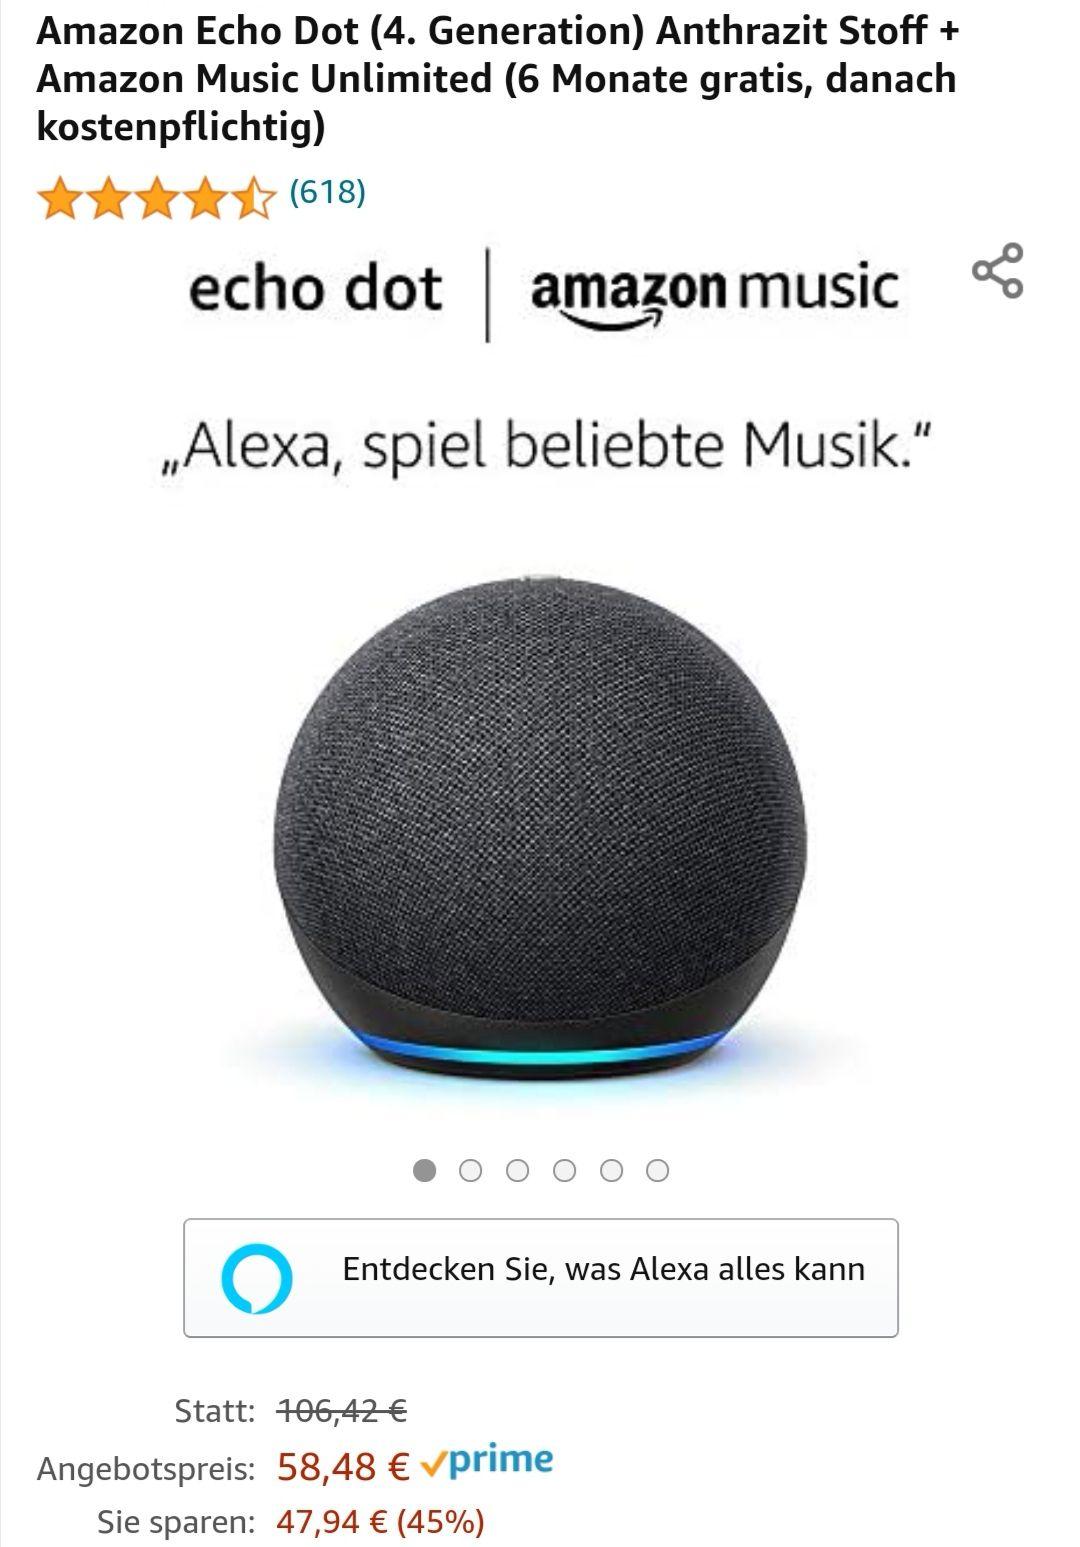 [Amazon] [Neukunde/ggf. auch ohne aktives Abo] neuer ECHO Dot 4. Generation + 6 Monate Music unlimited